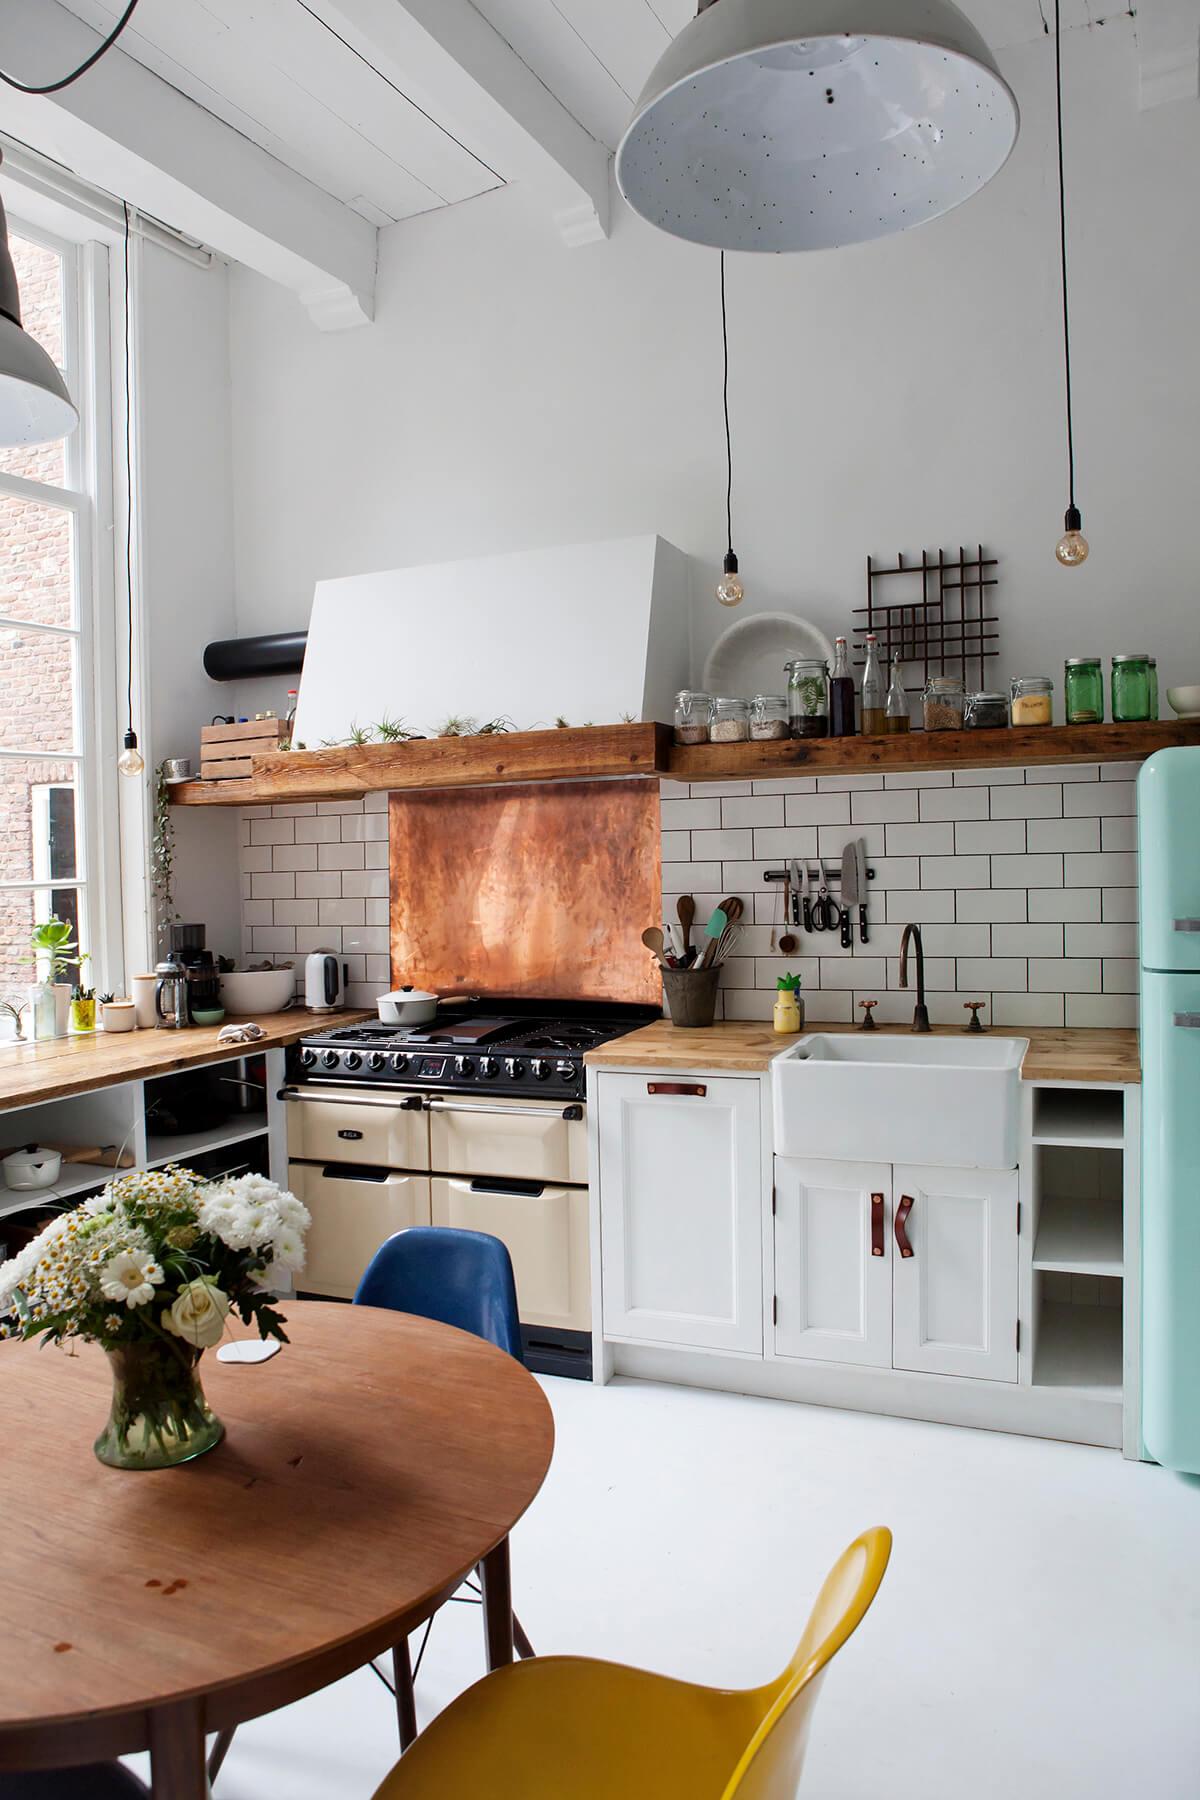 Vintage Kitchen Decor Ideas with Retro References